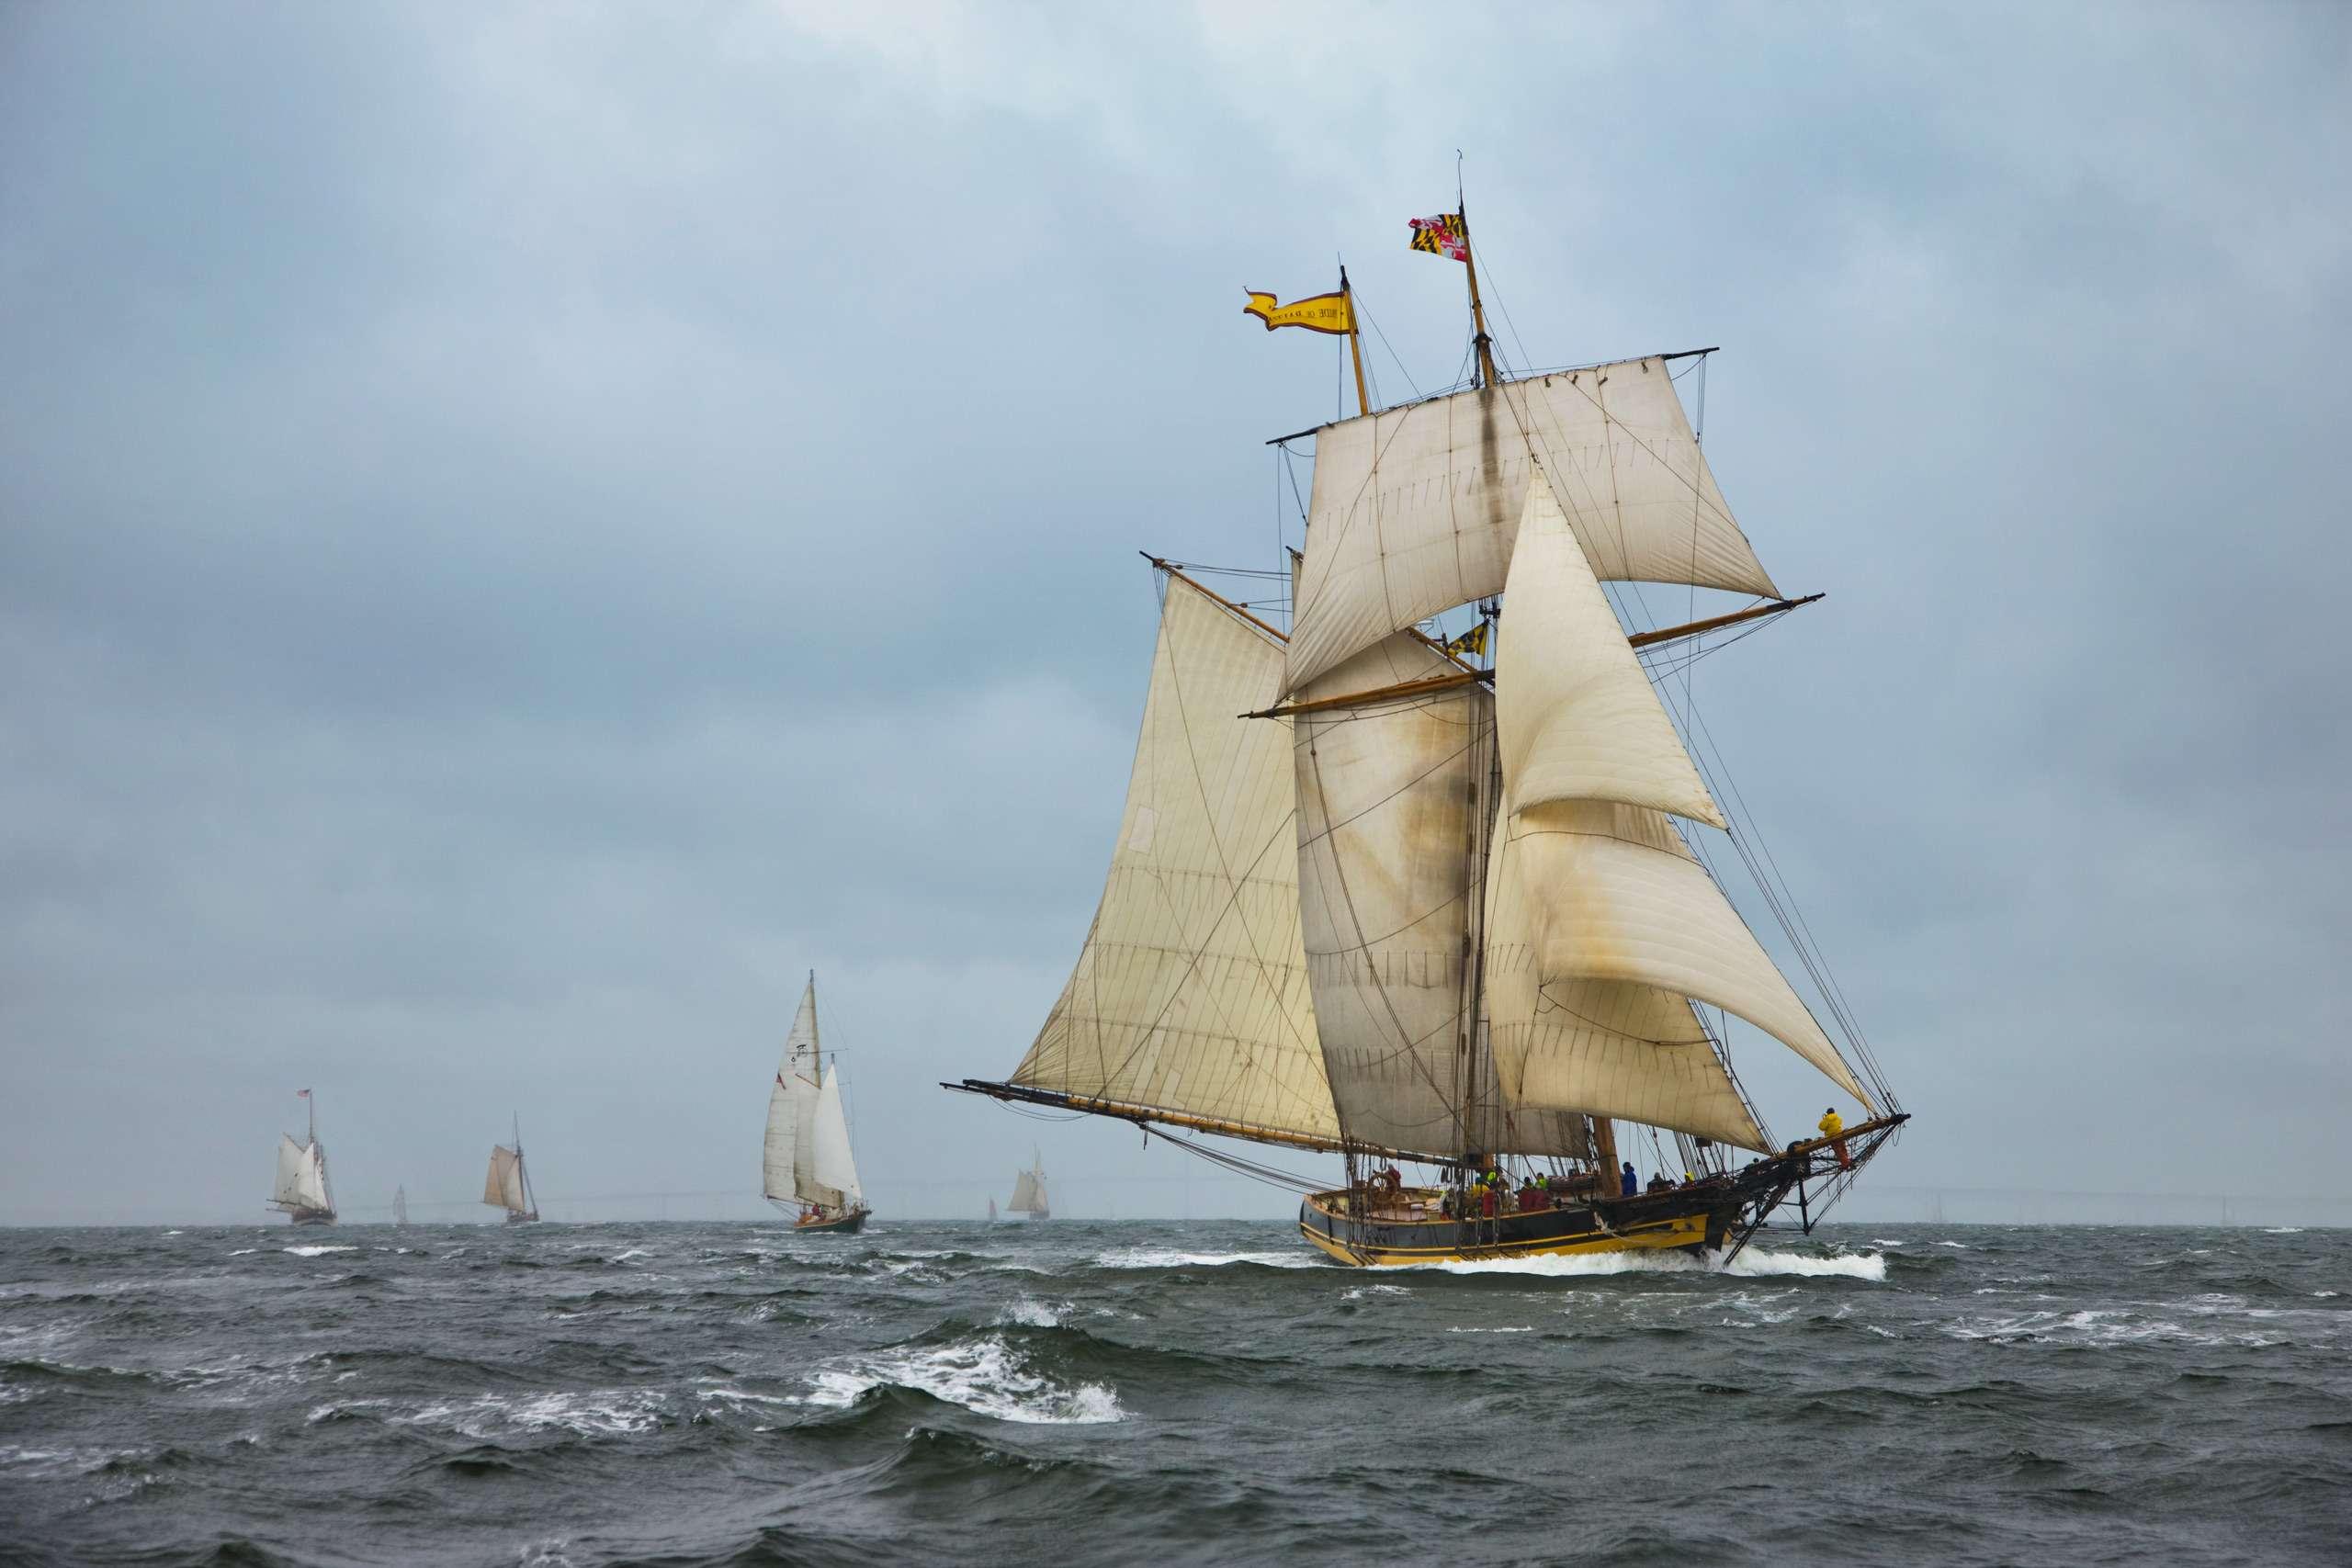 PORTFOLIO - Sailing - Tall Ships #8-PCG468